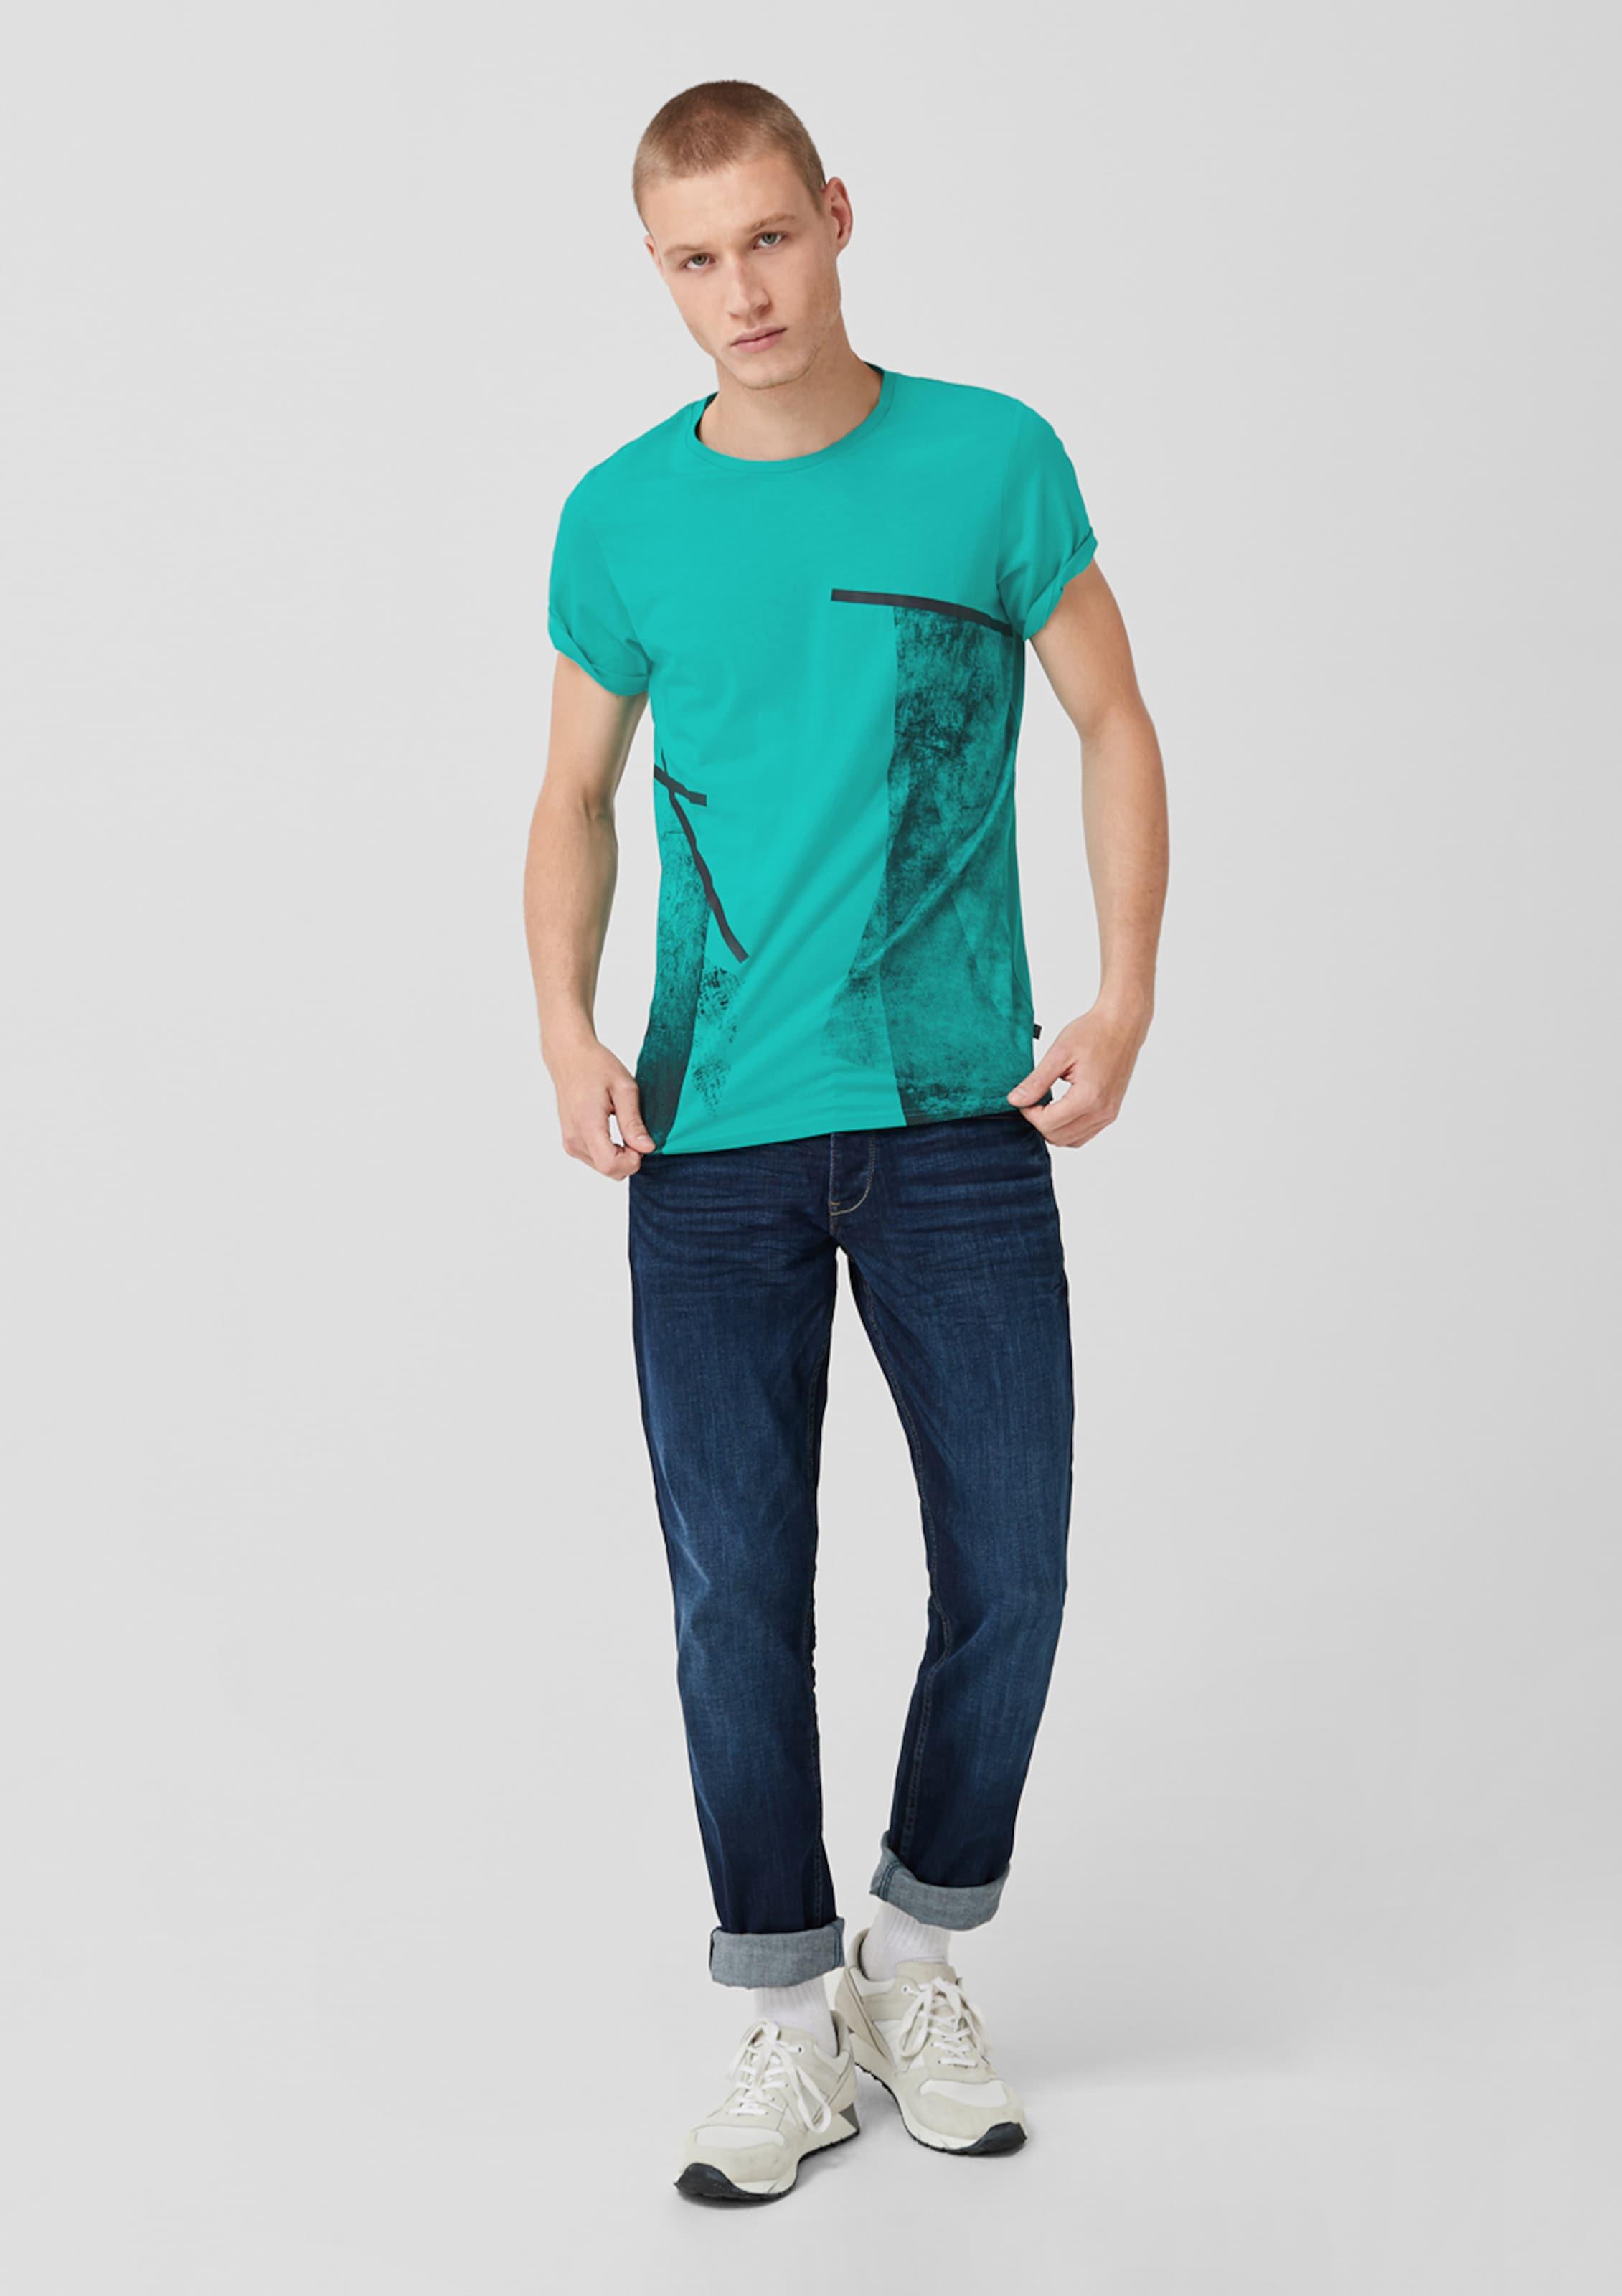 Mit Türkis Q In Designed By shirt T Frontprint s mOyN0Pn8vw